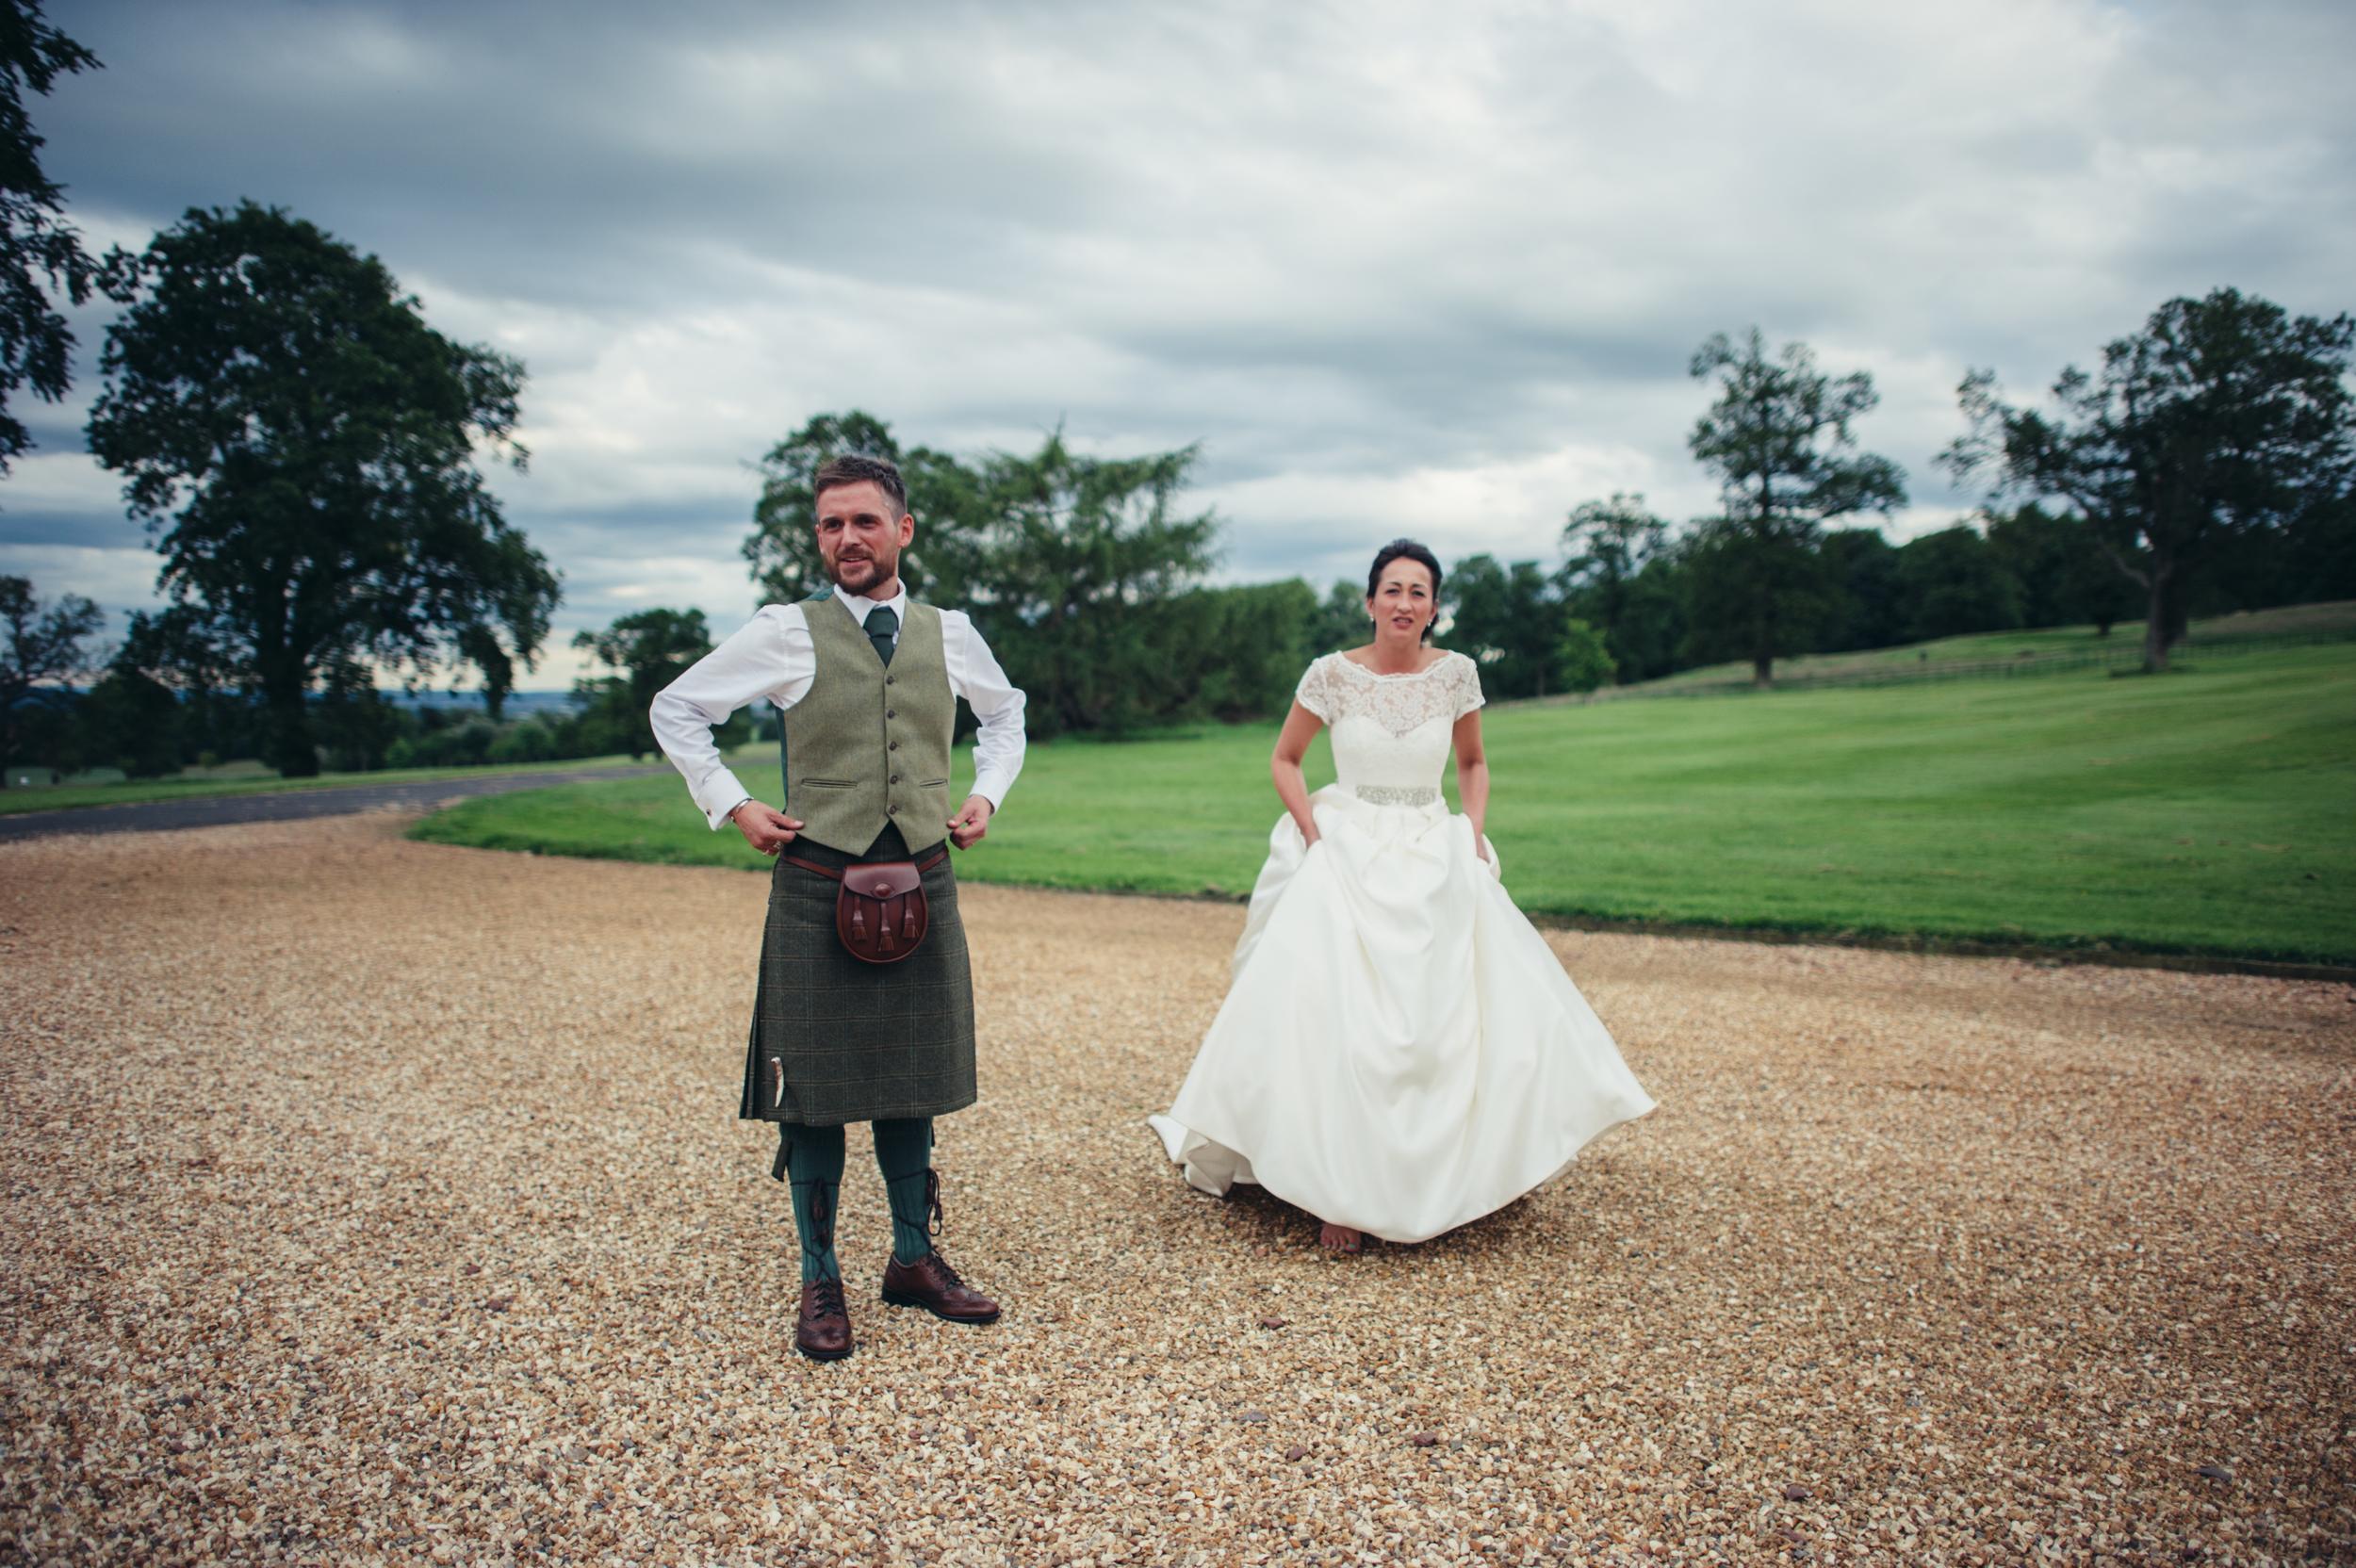 0177-lisa-devine-alternative-creative-wedding-photography-glasgow-edinburgh.JPG